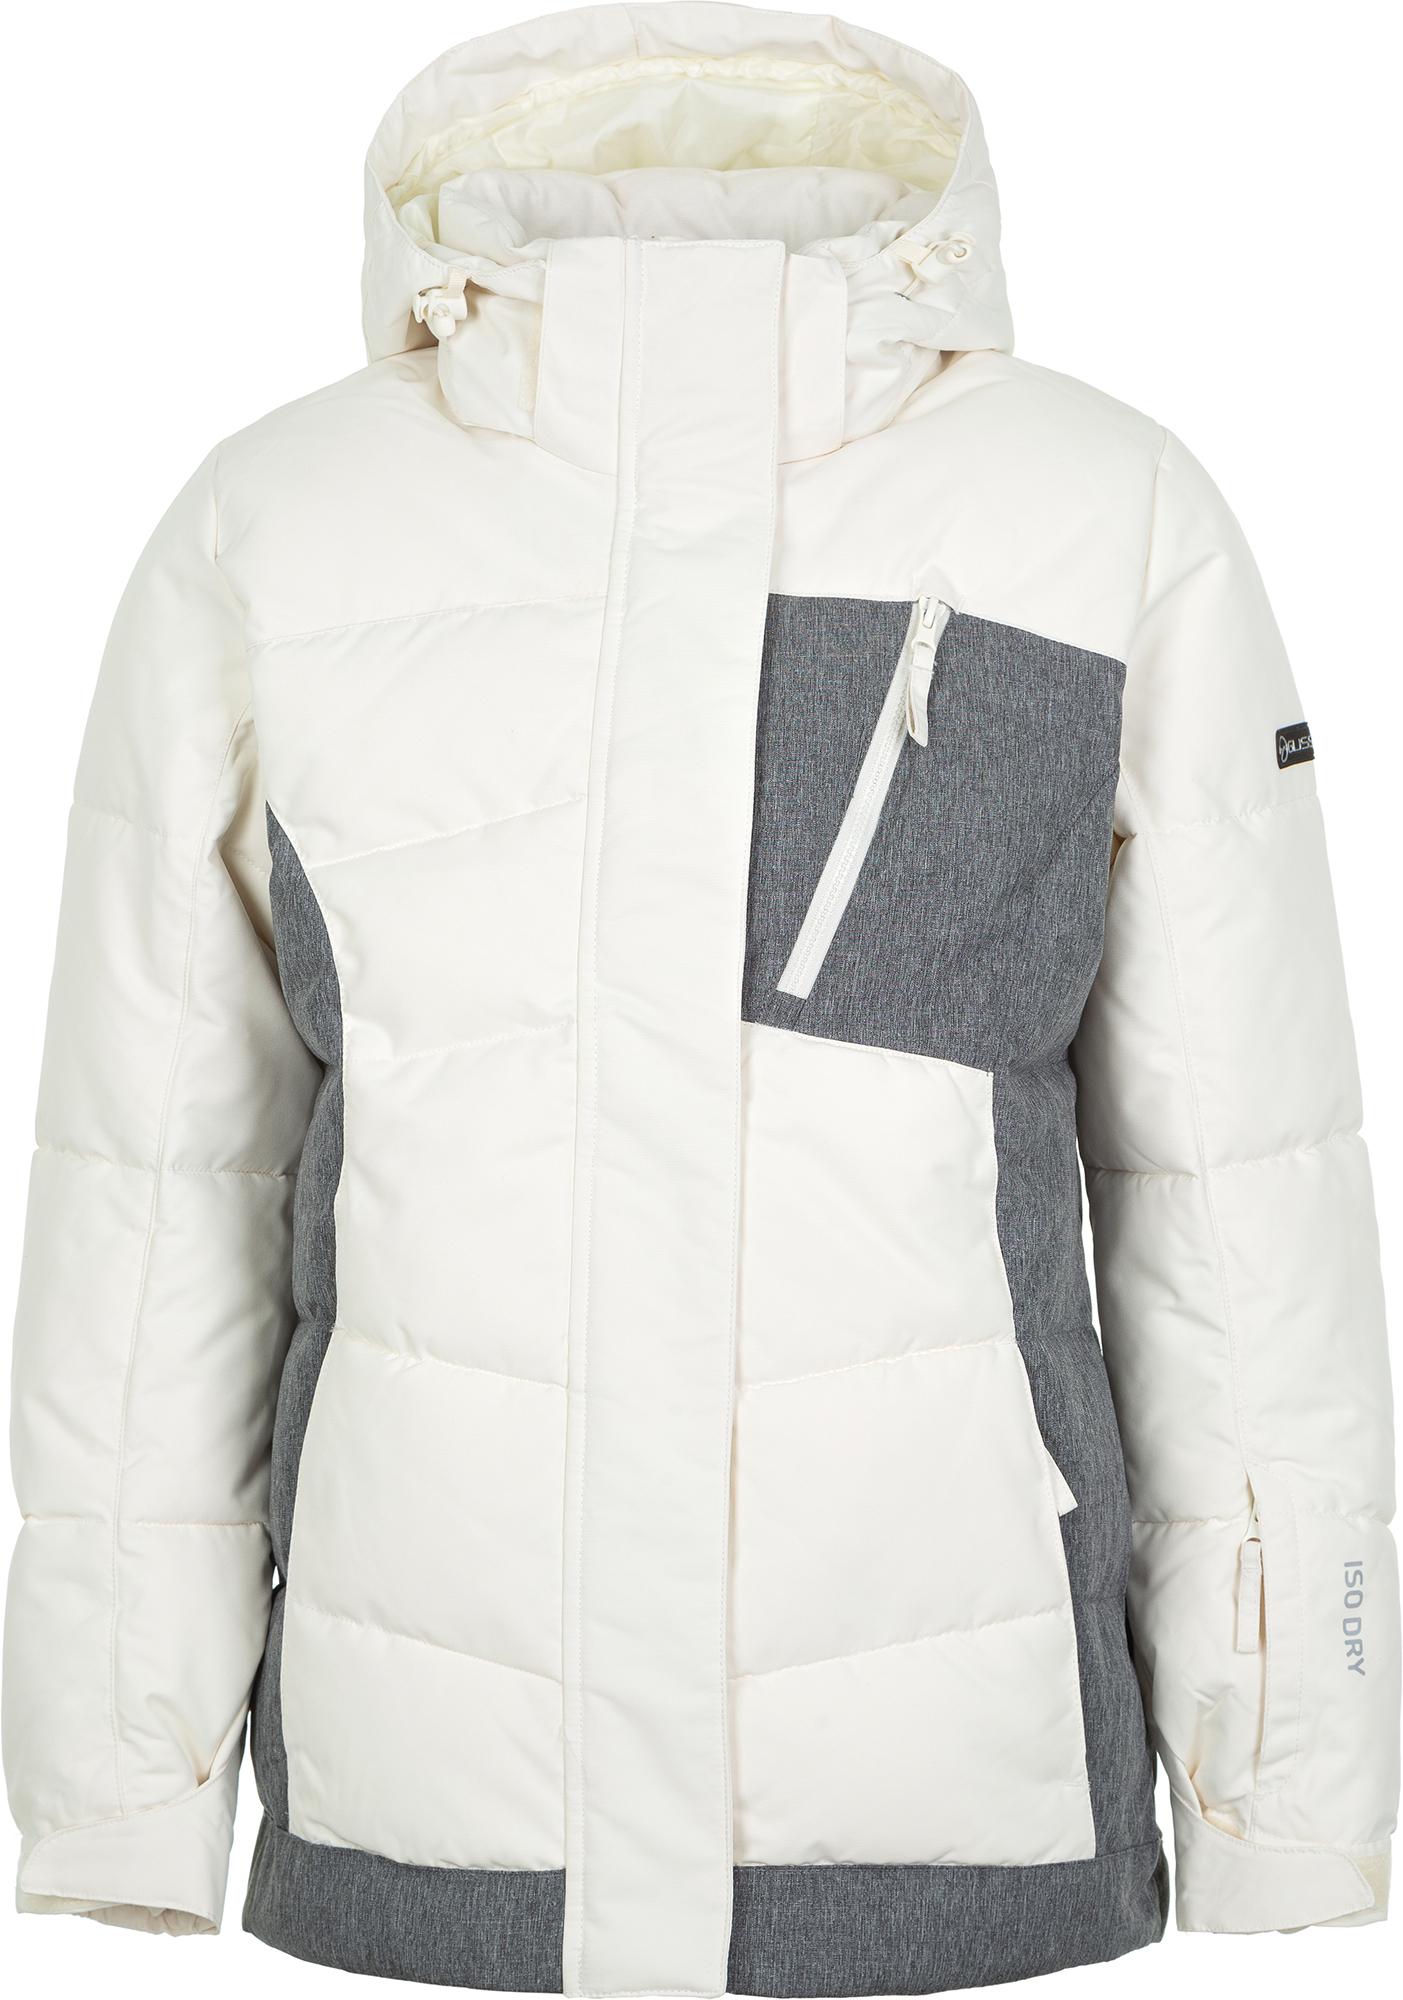 Glissade Куртка утепленная для девочек Glissade, размер 164 куртка для девочек atplay цвет серый 1jk803 размер 86